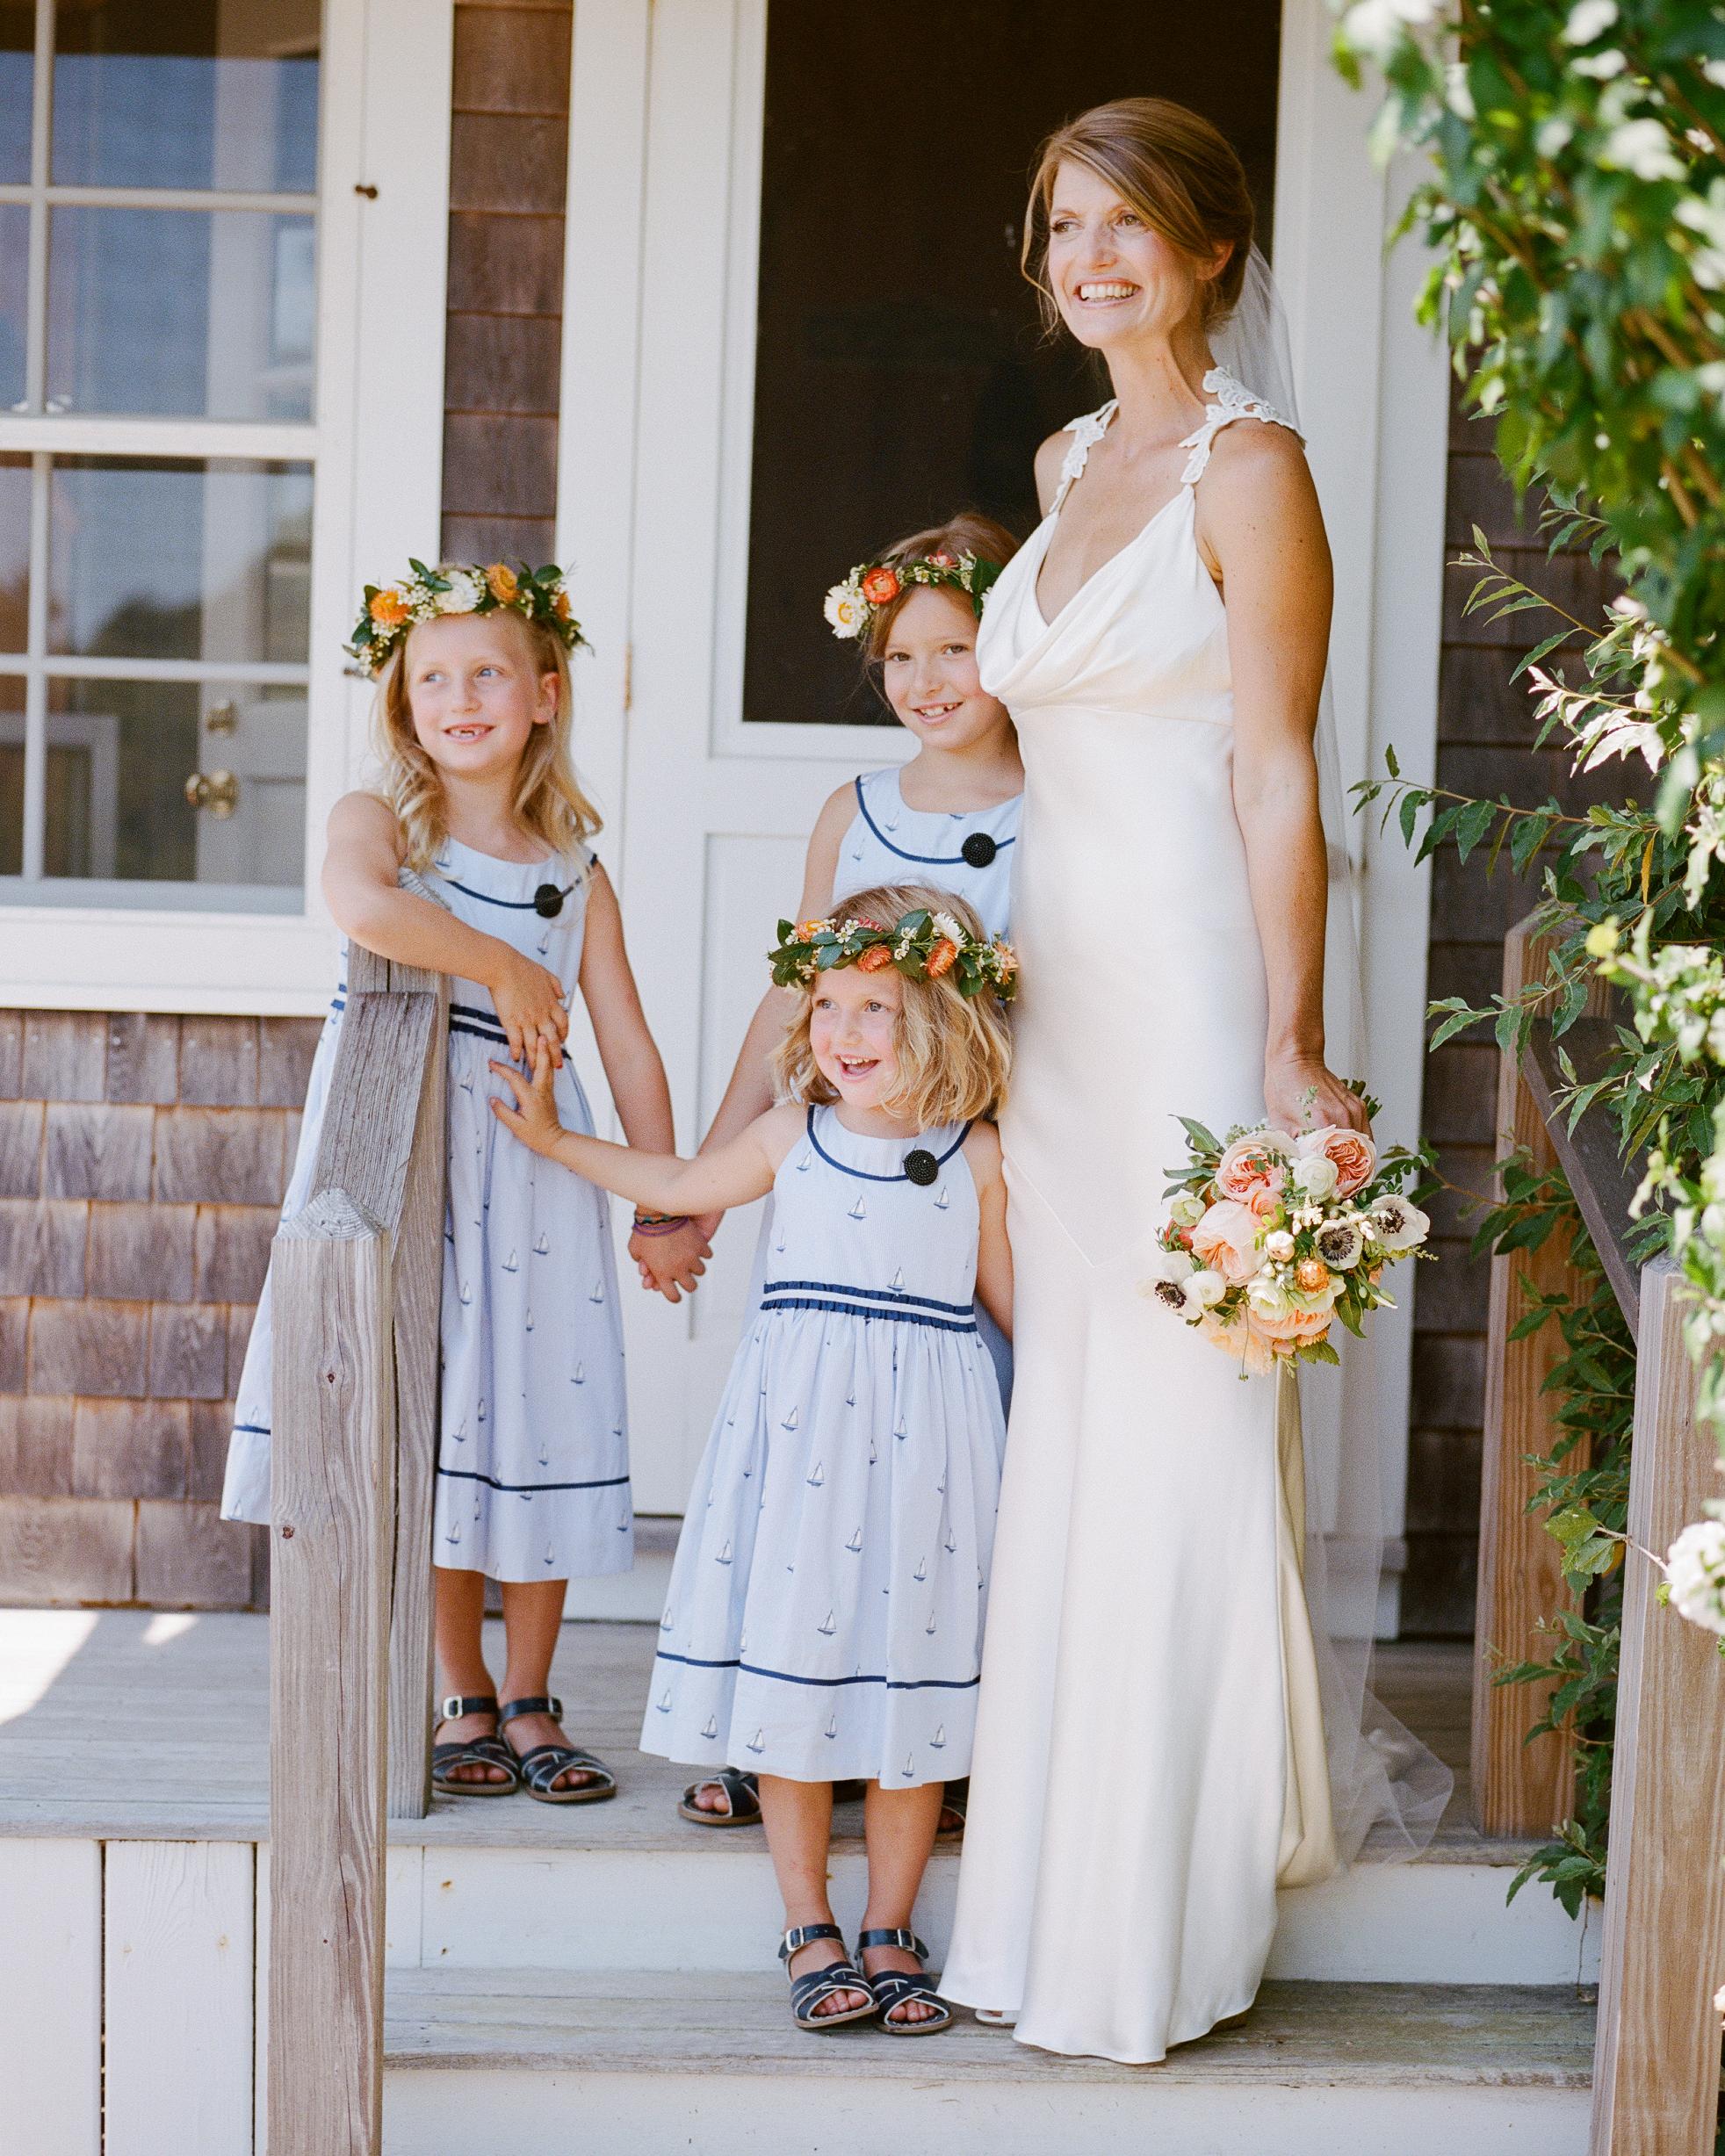 jocelyn-graham-wedding-flowergirls-0579-s111847-0315.jpg